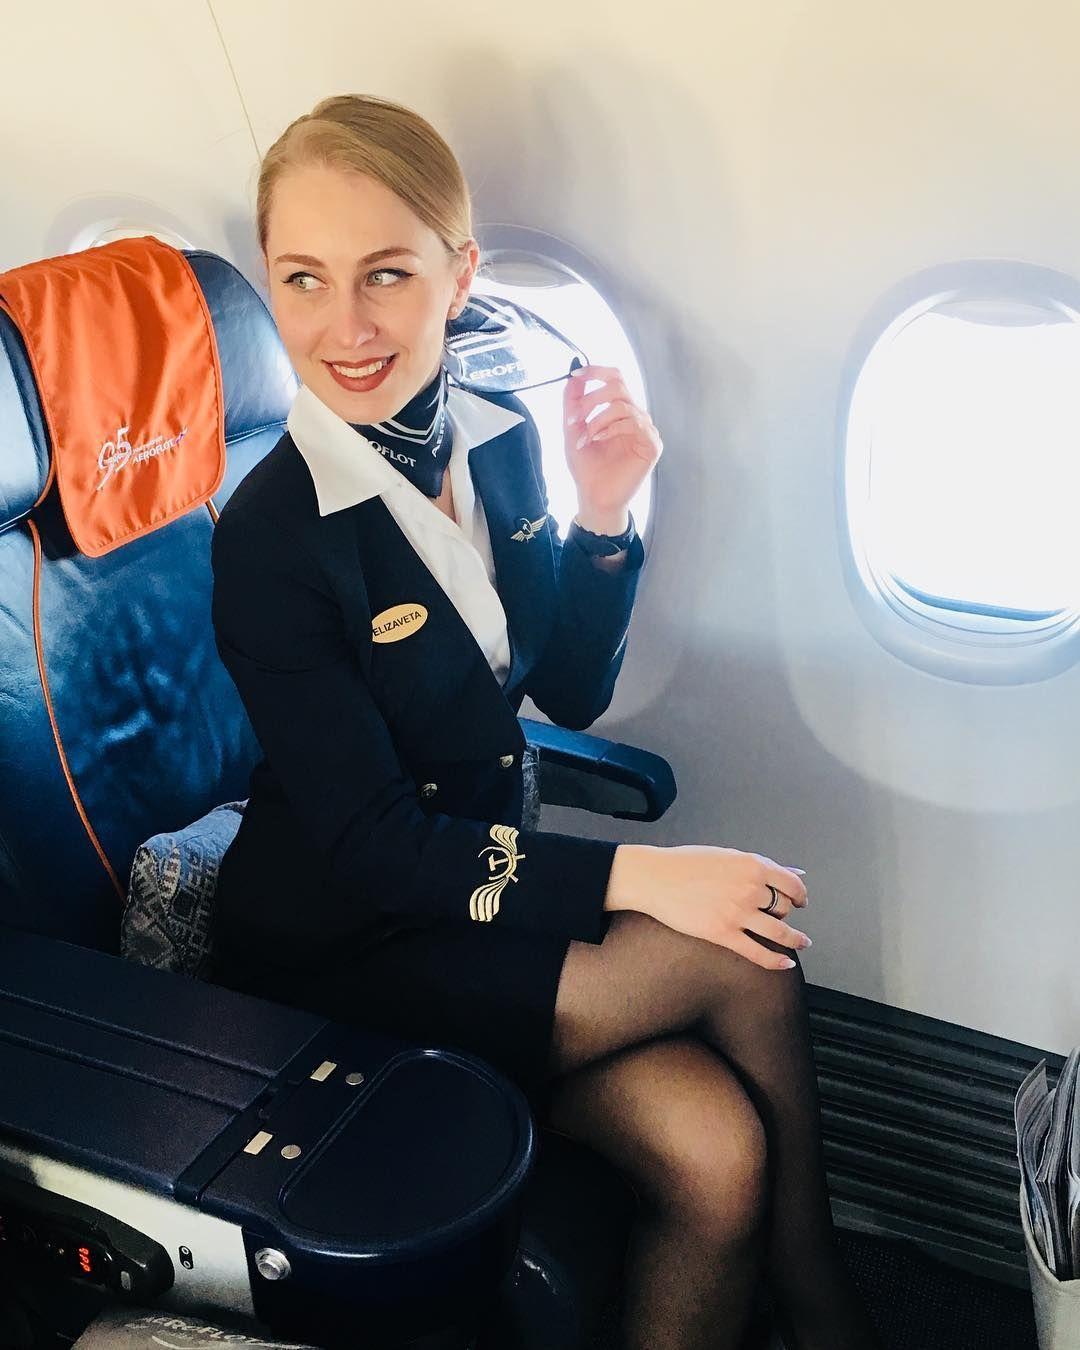 Pin On Flight Attendants World Class